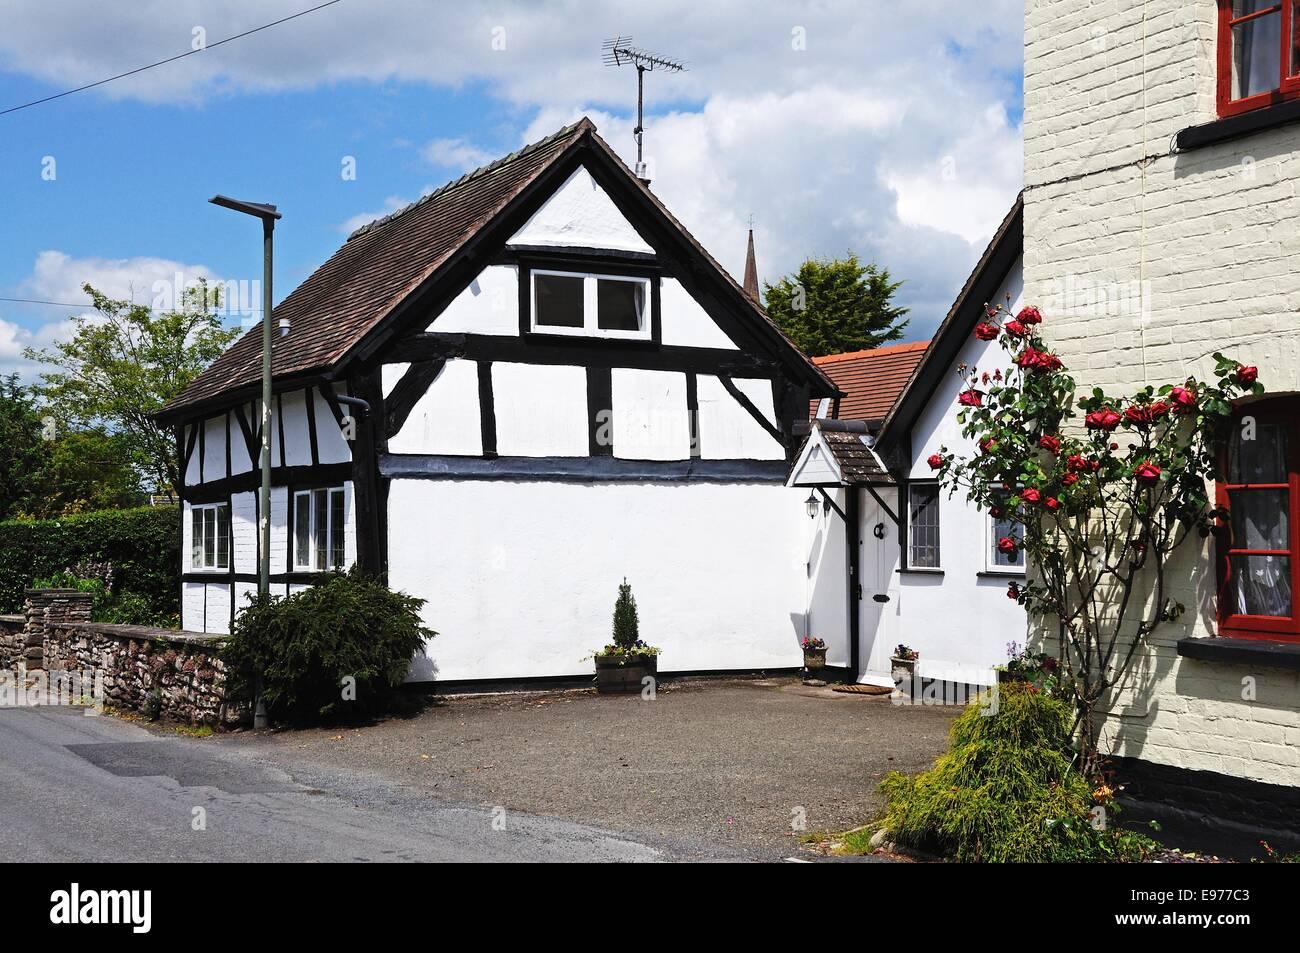 White timbered cottages along Mill Bank, Weobley, Herefordshire, England, UK, Western Europe. - Stock Image